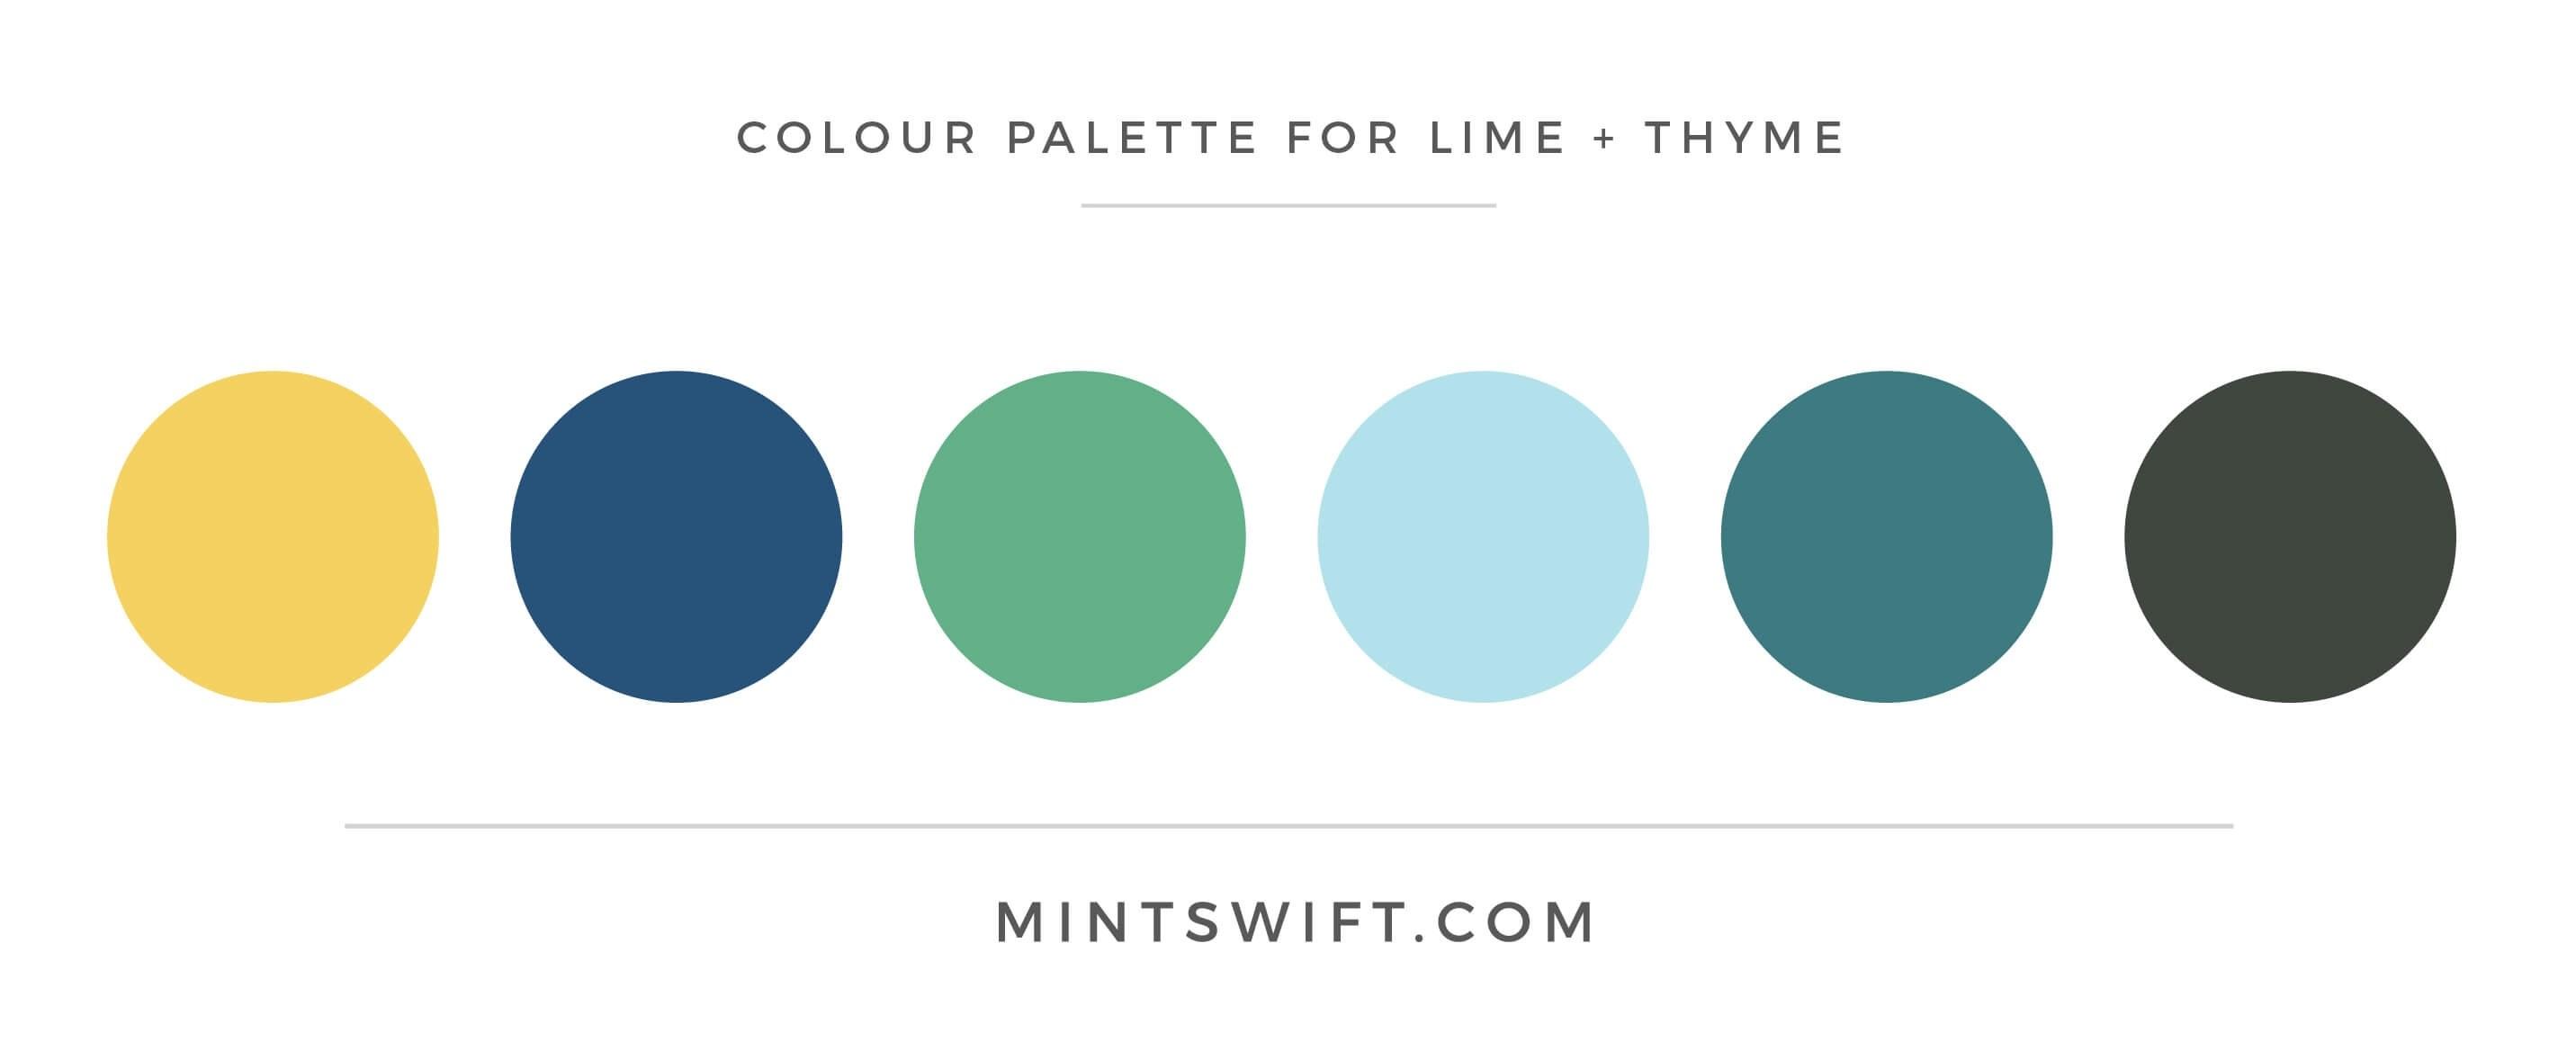 Lime + Thyme - Colour Palette - Brand & Website Design - MintSwift